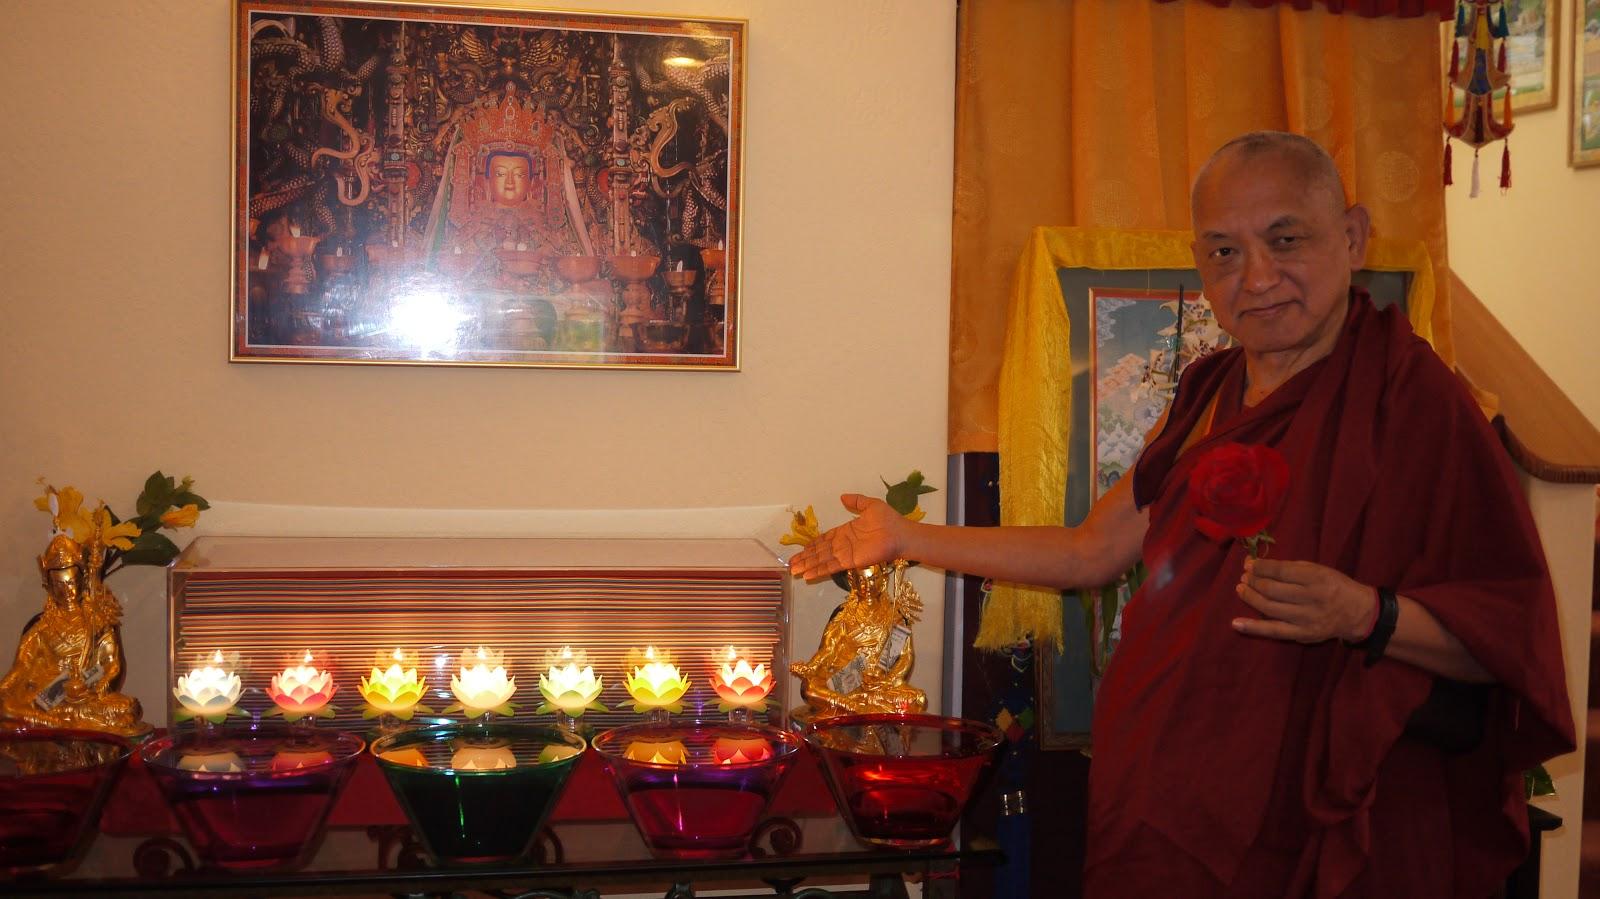 Offerings made at Kachoe Dechen Ling in front of Prajnaparamita